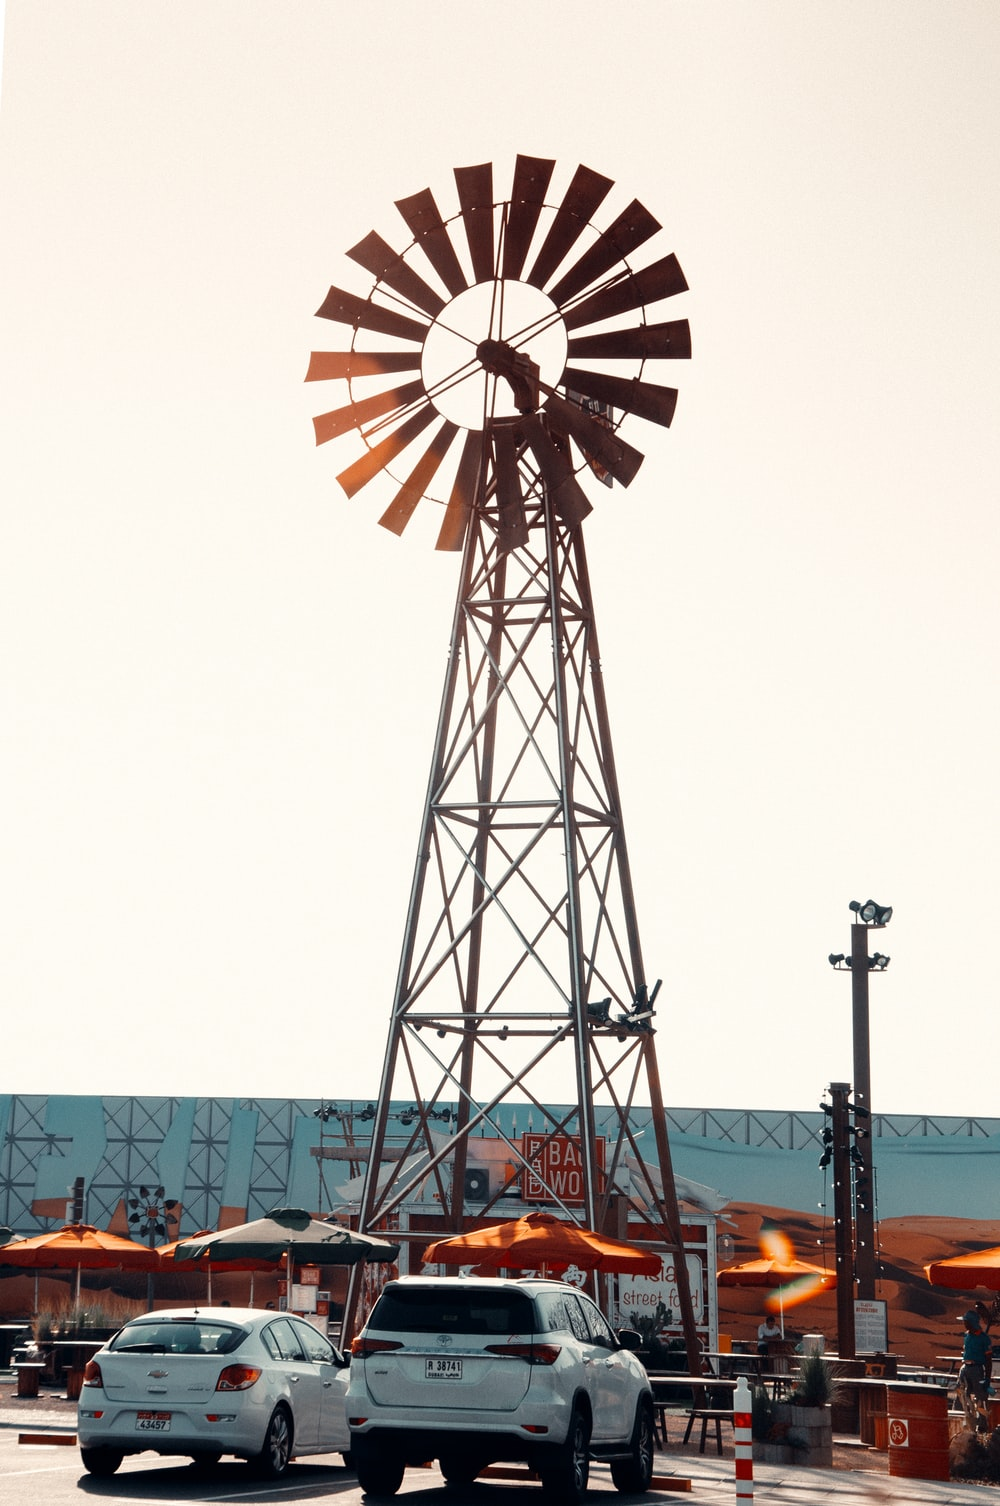 orange and white ferris wheel under white sky during daytime